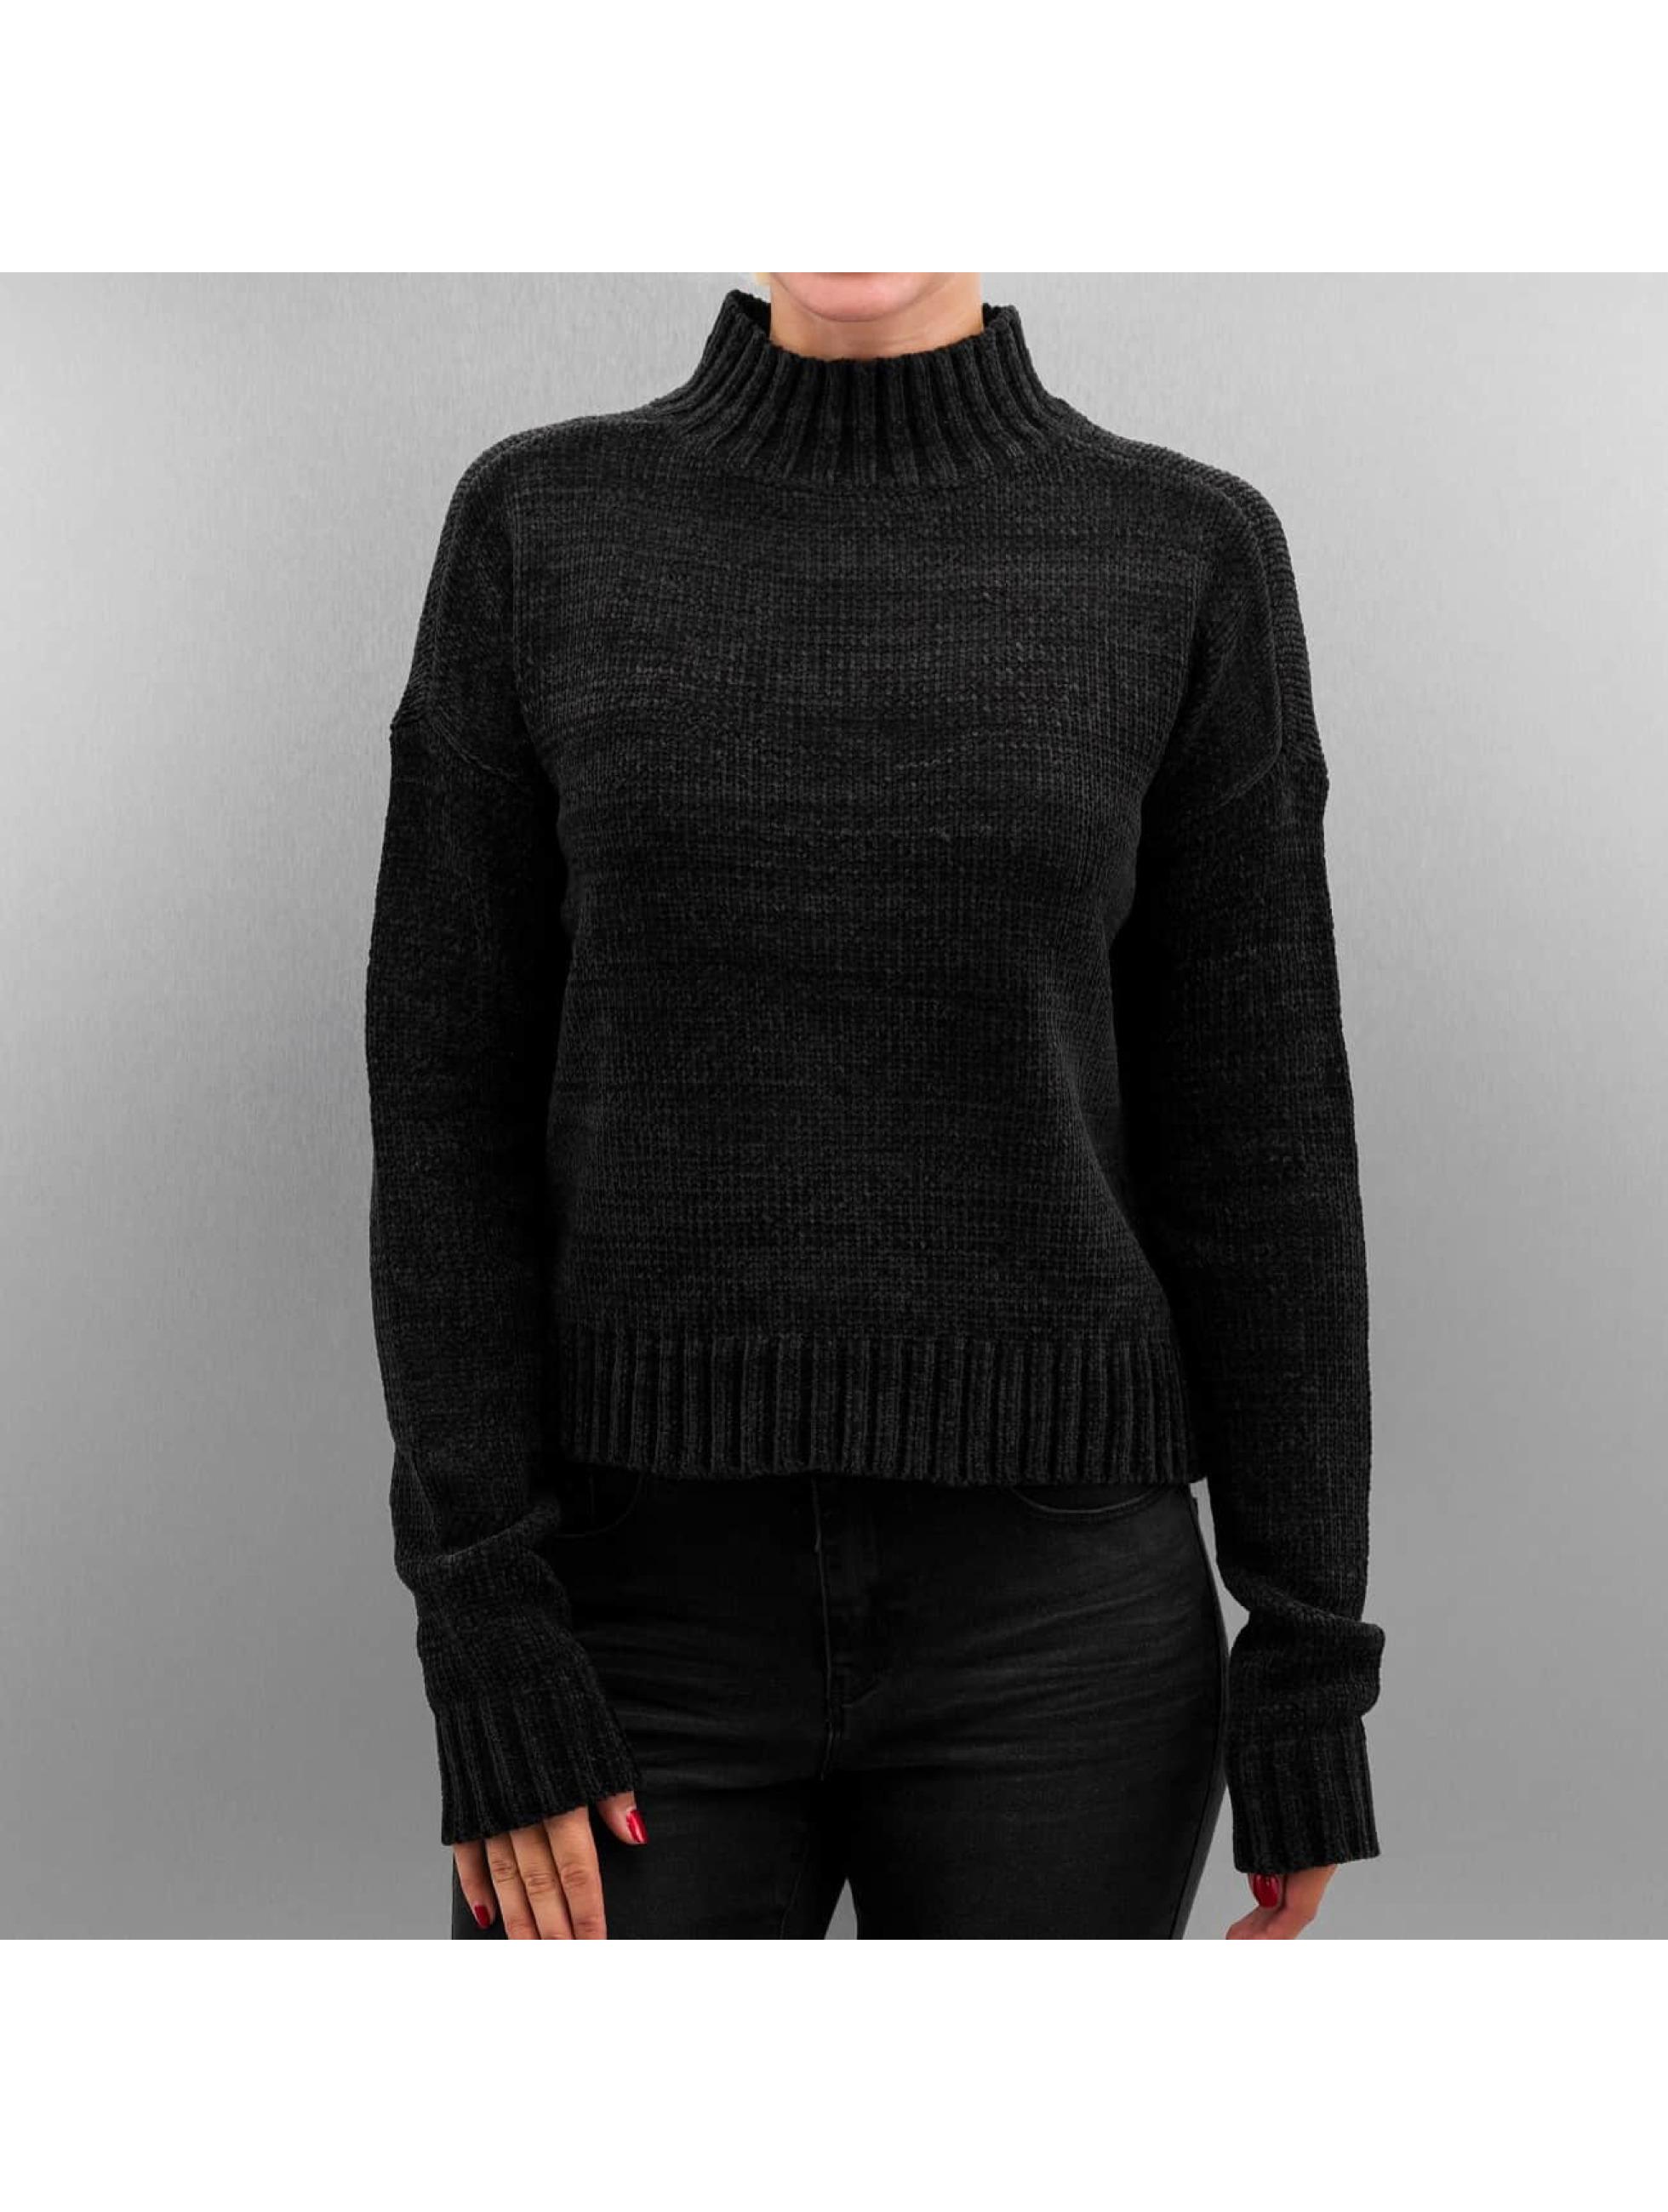 Urban Classics Haut / Pullover Ladies Chenille Turtleneck en noir